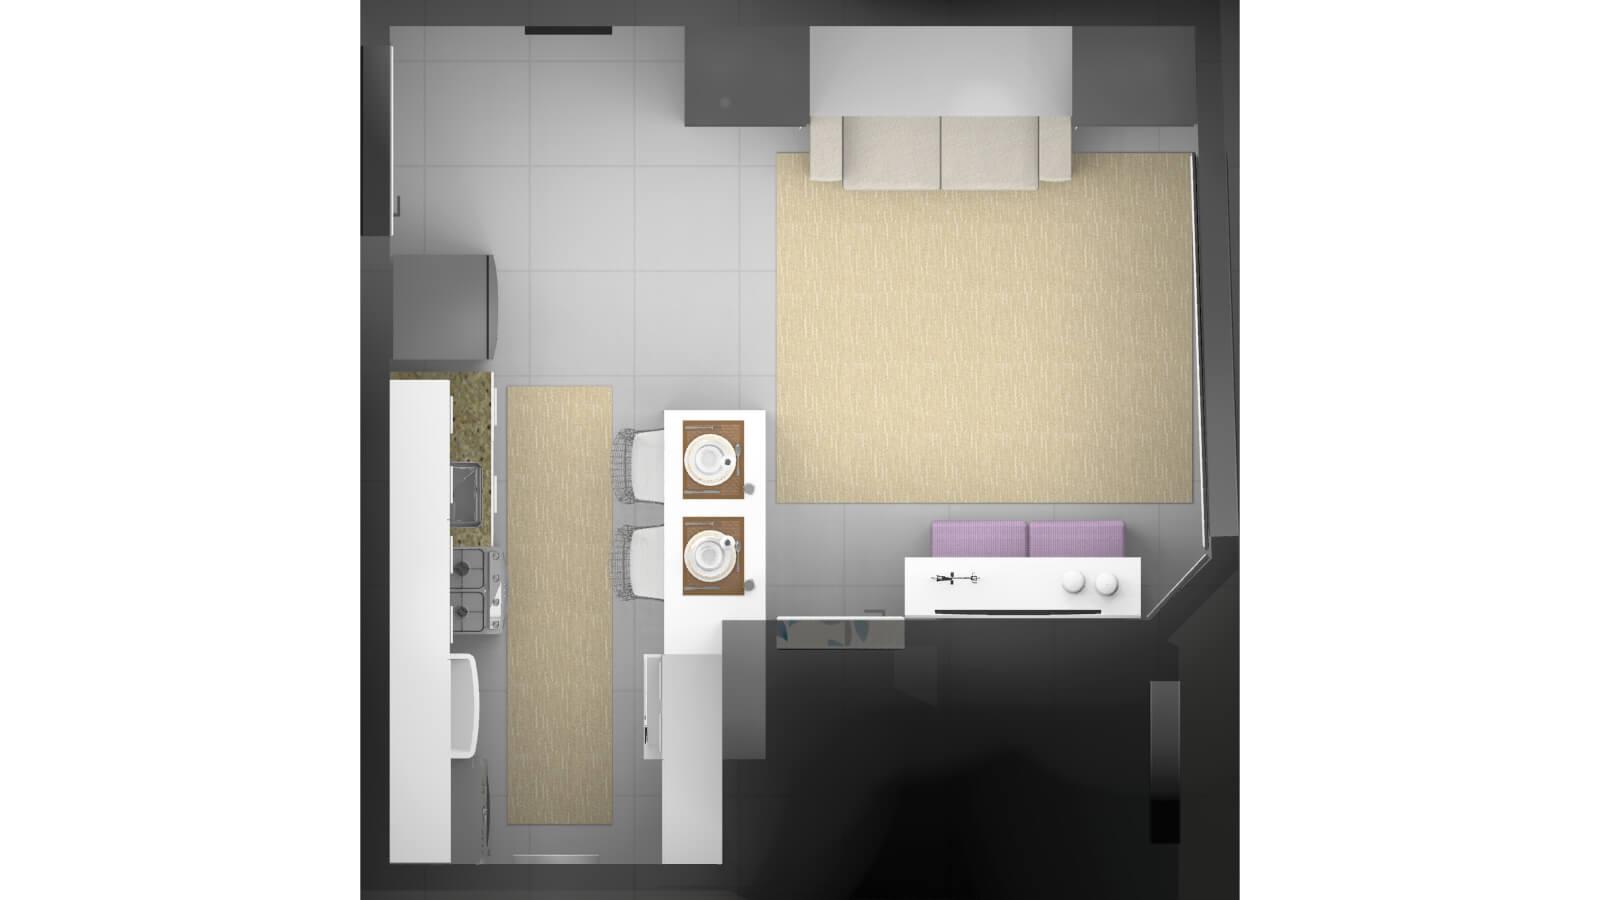 Alfa Center Kitnet Novo Hamburgo - Contrutora G Ghem Engenharia - 3